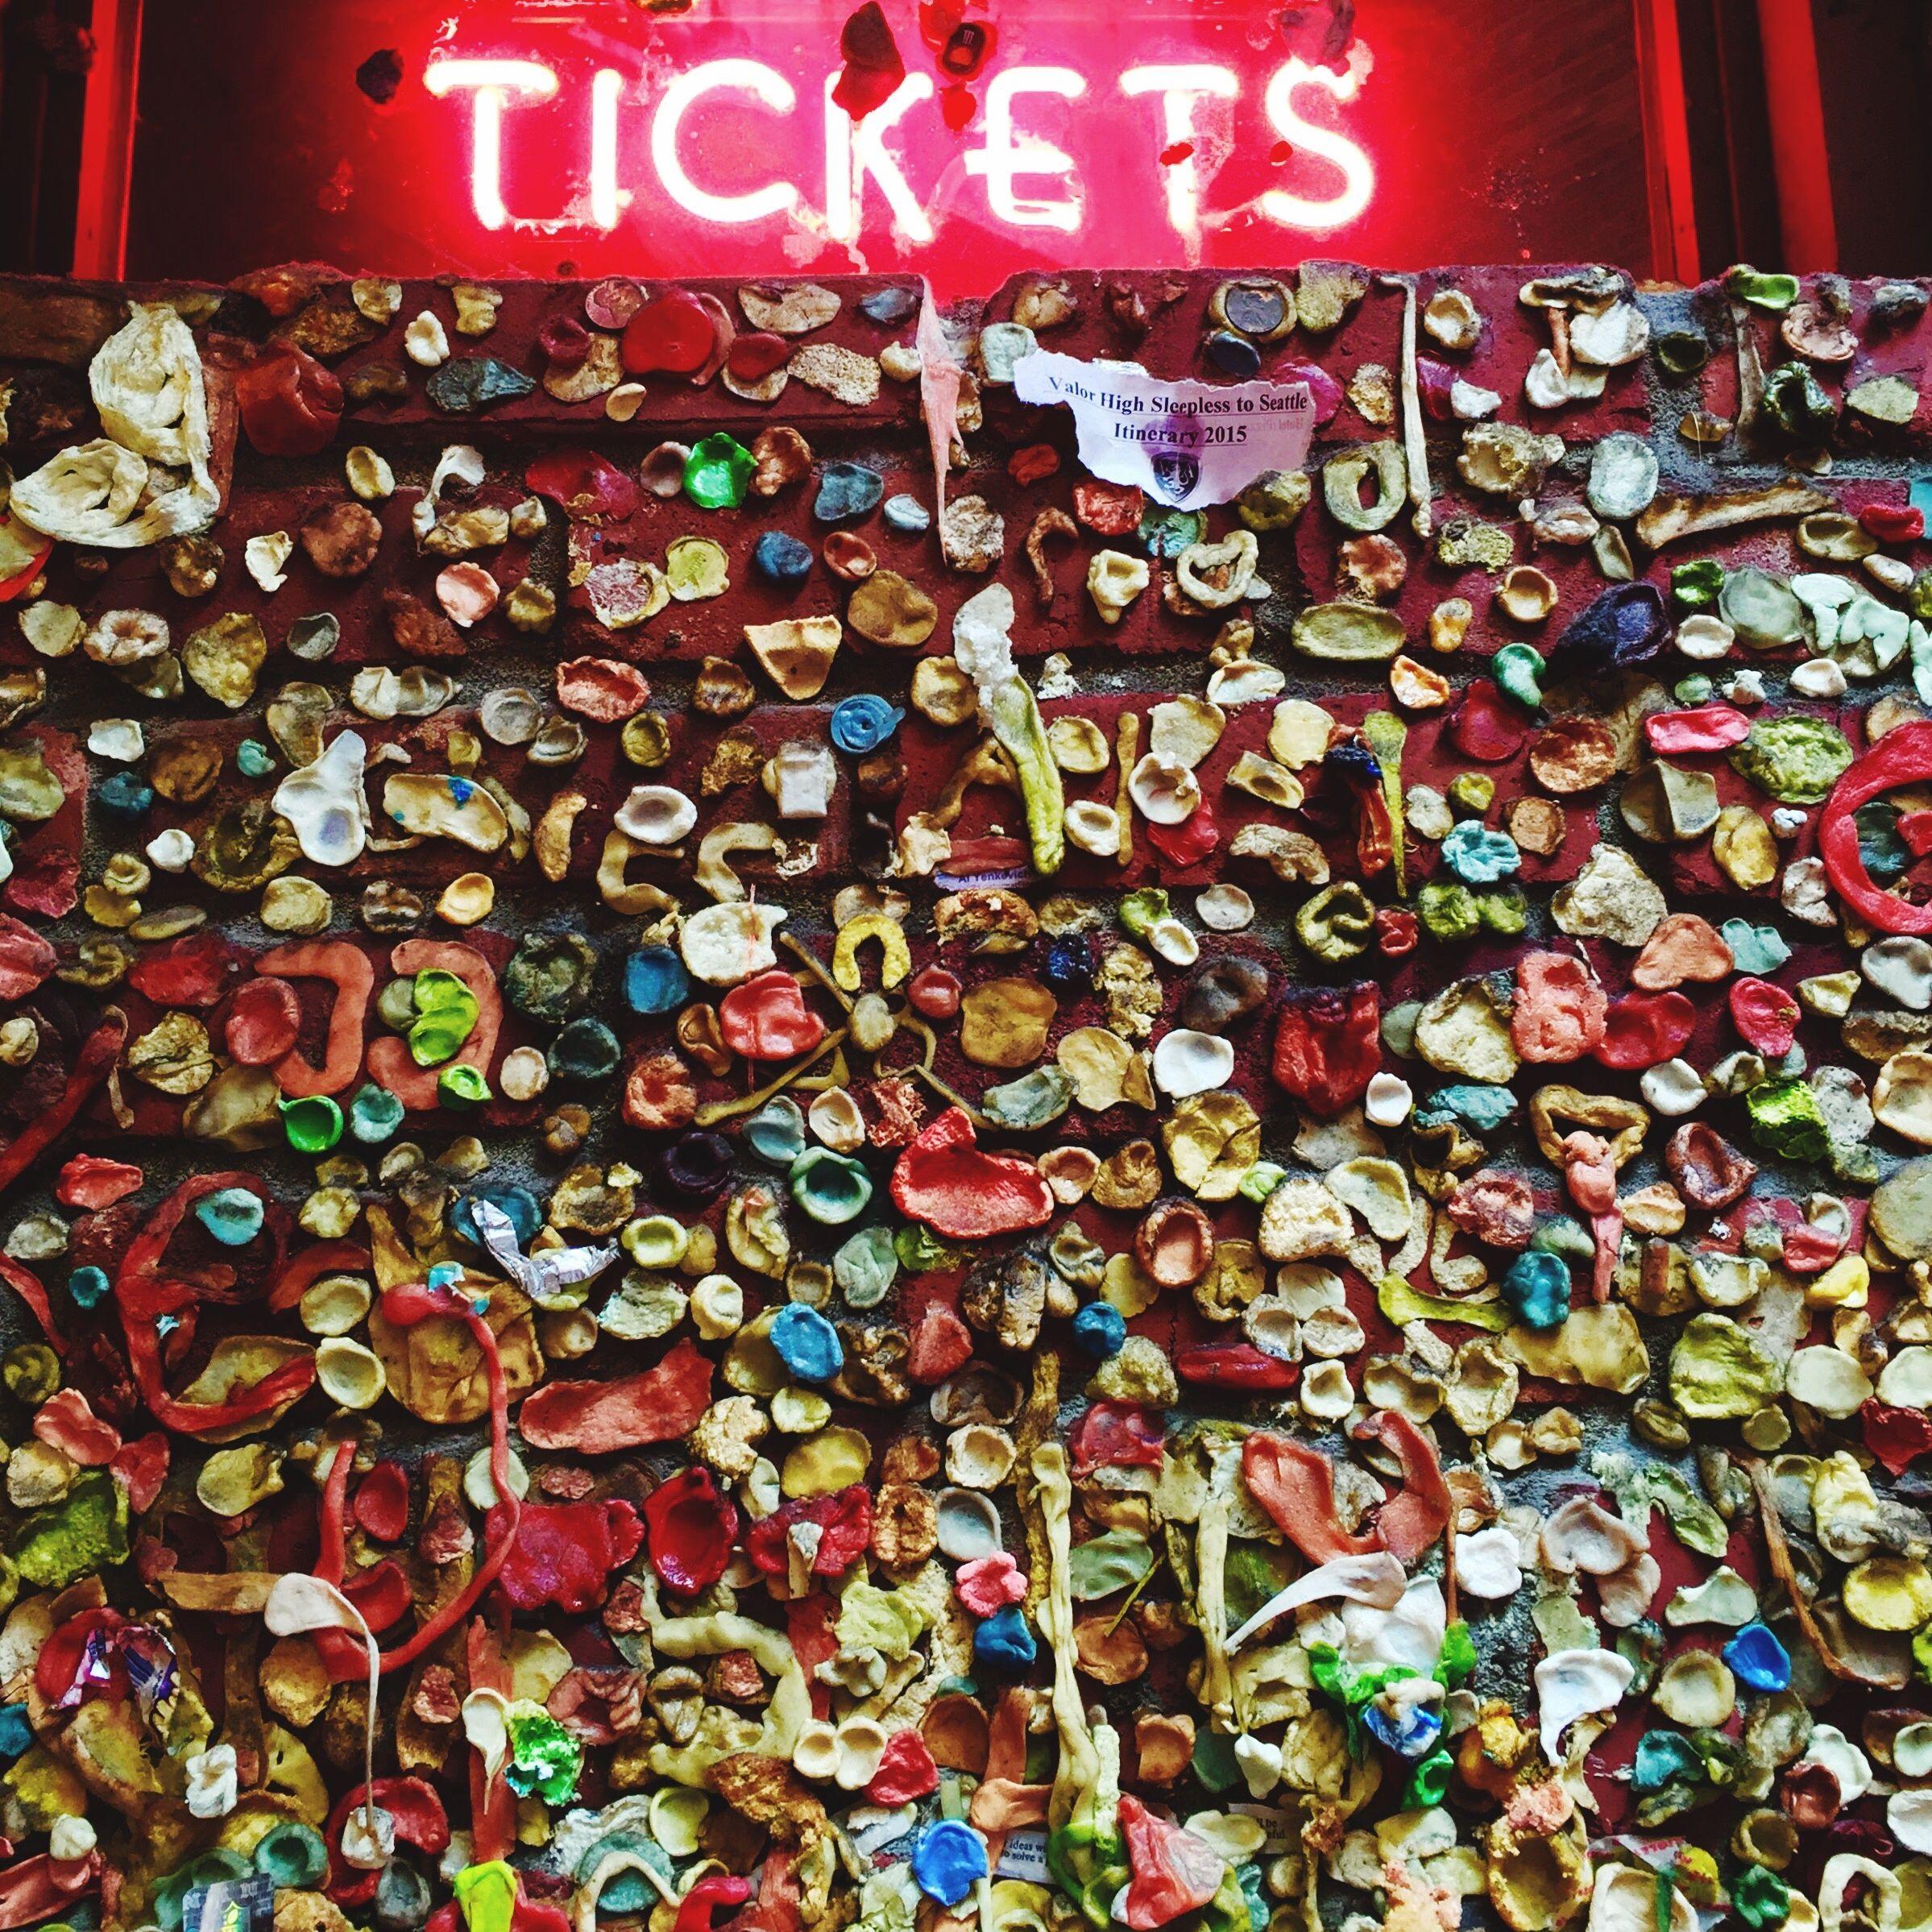 8 Weird Facts About Seattle's Gum Wall